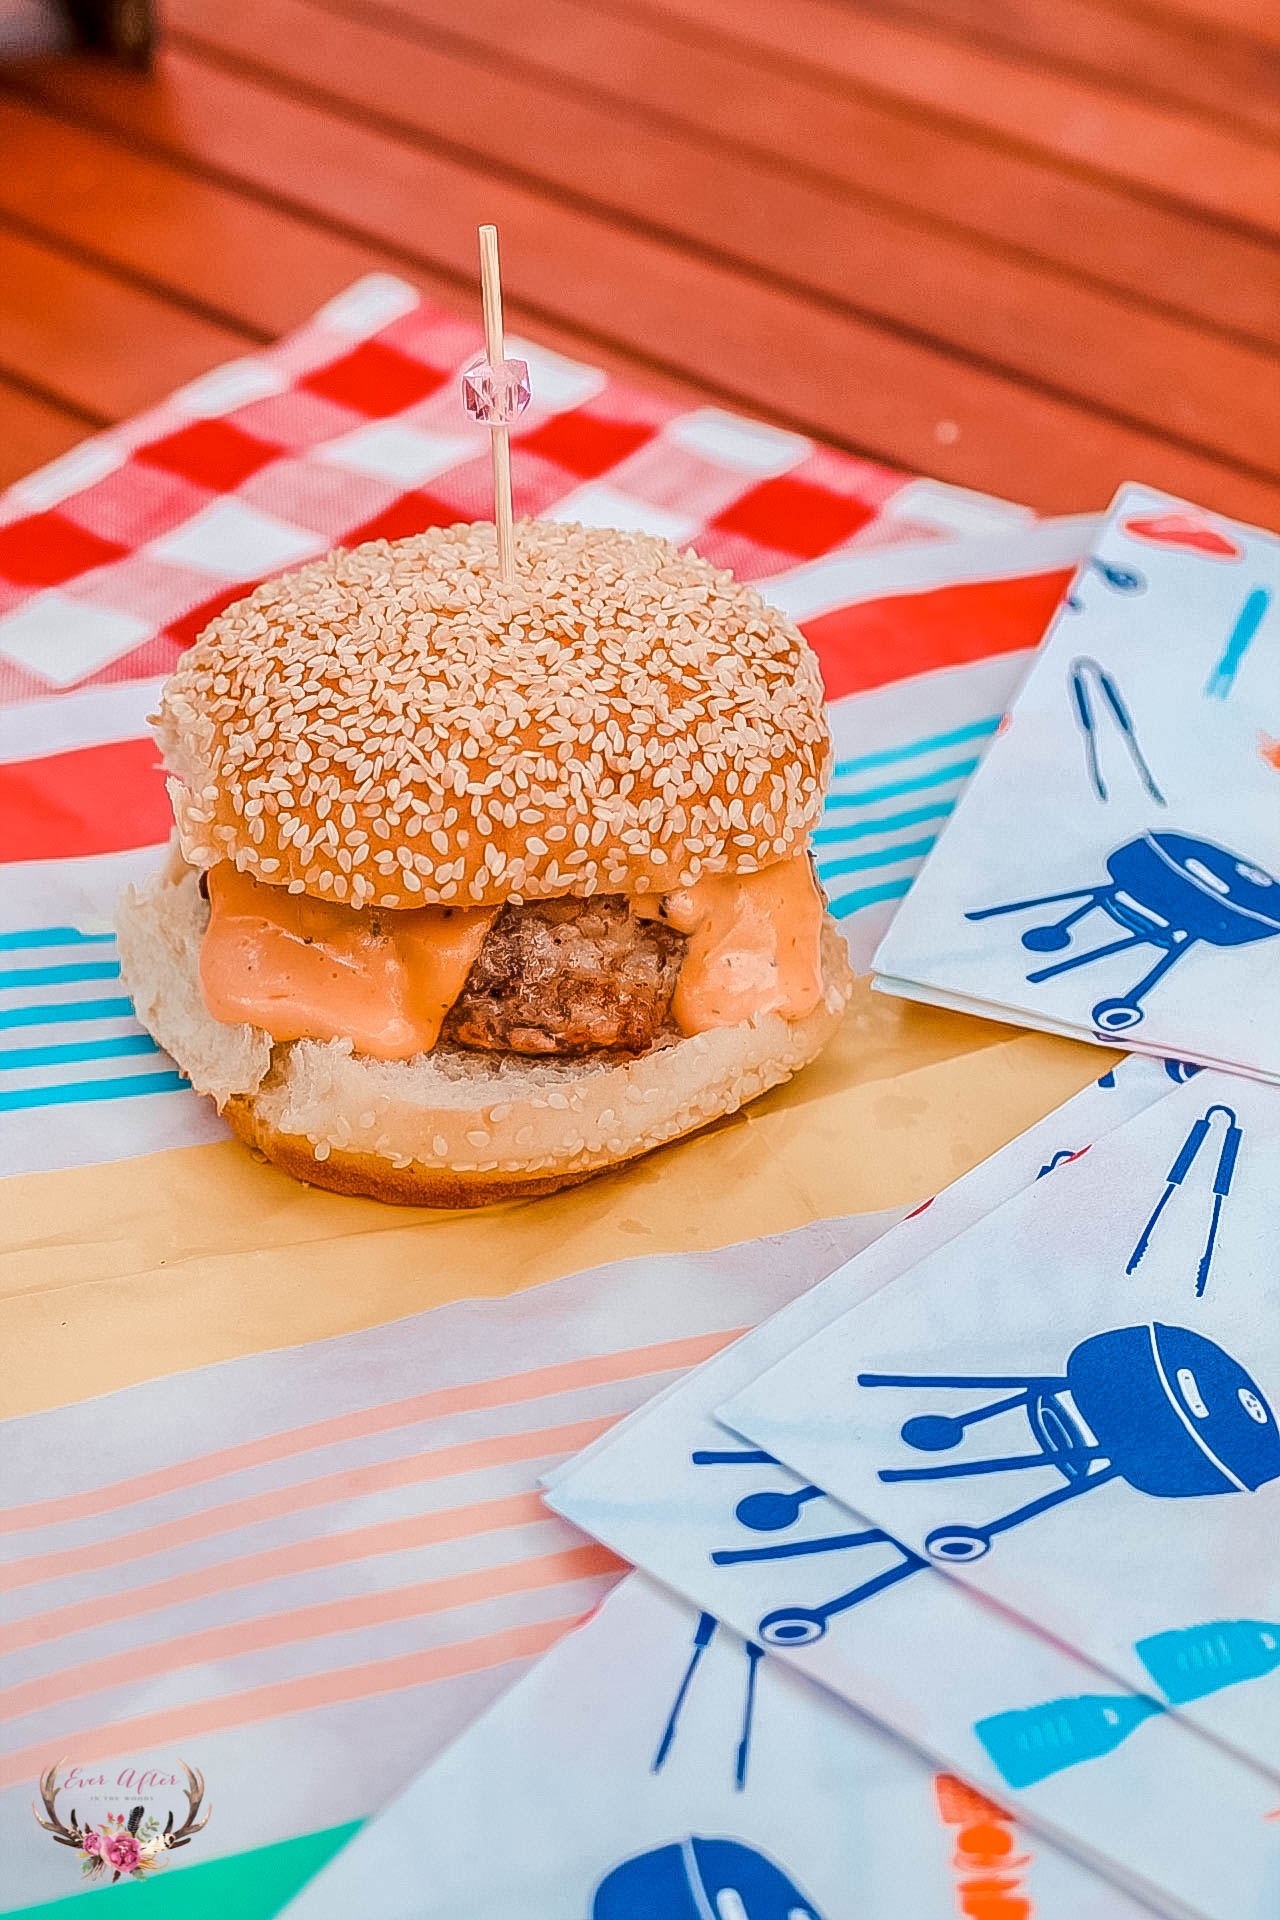 Heinz art of the burger